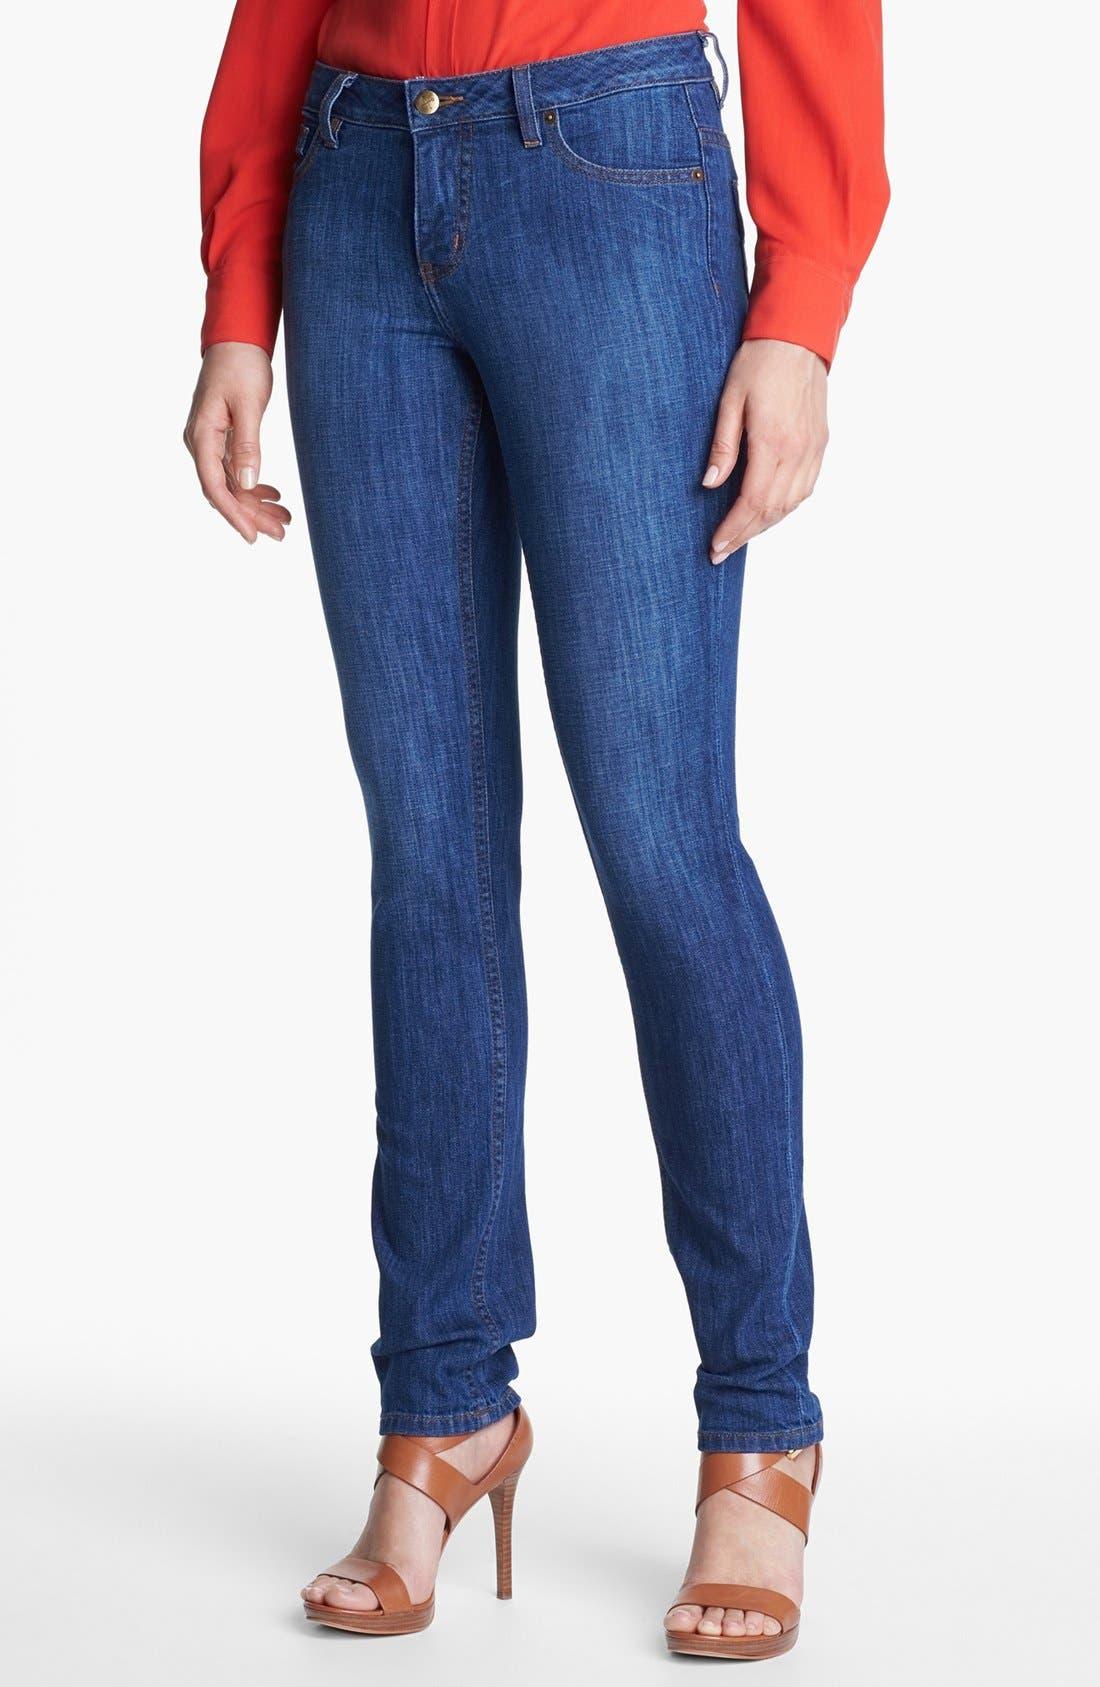 Alternate Image 1 Selected - Christopher Blue 'Sophia' Skinny Jeans